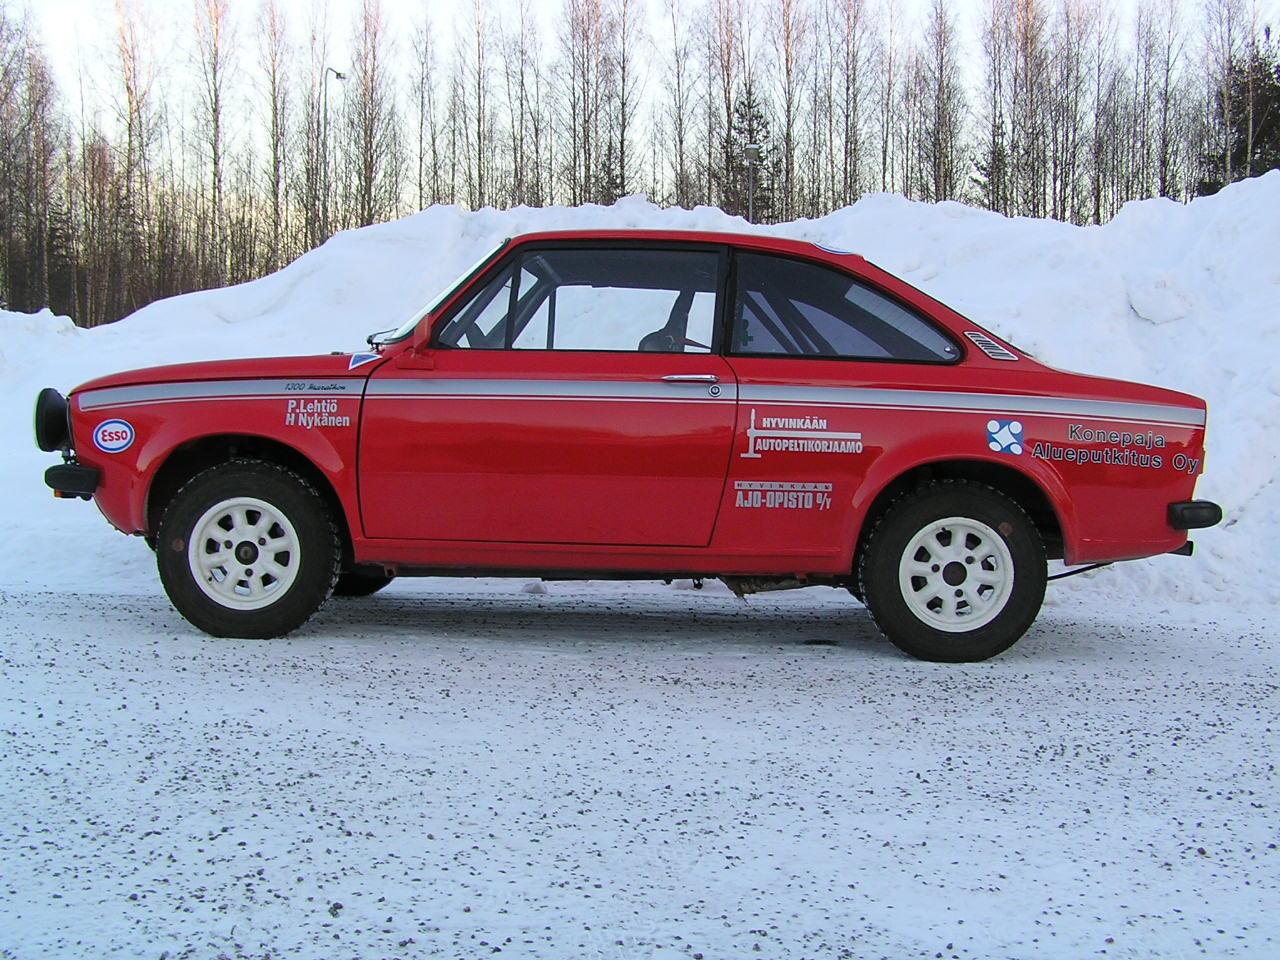 DAF-Rally-Pekka-Lehtio-Finland-